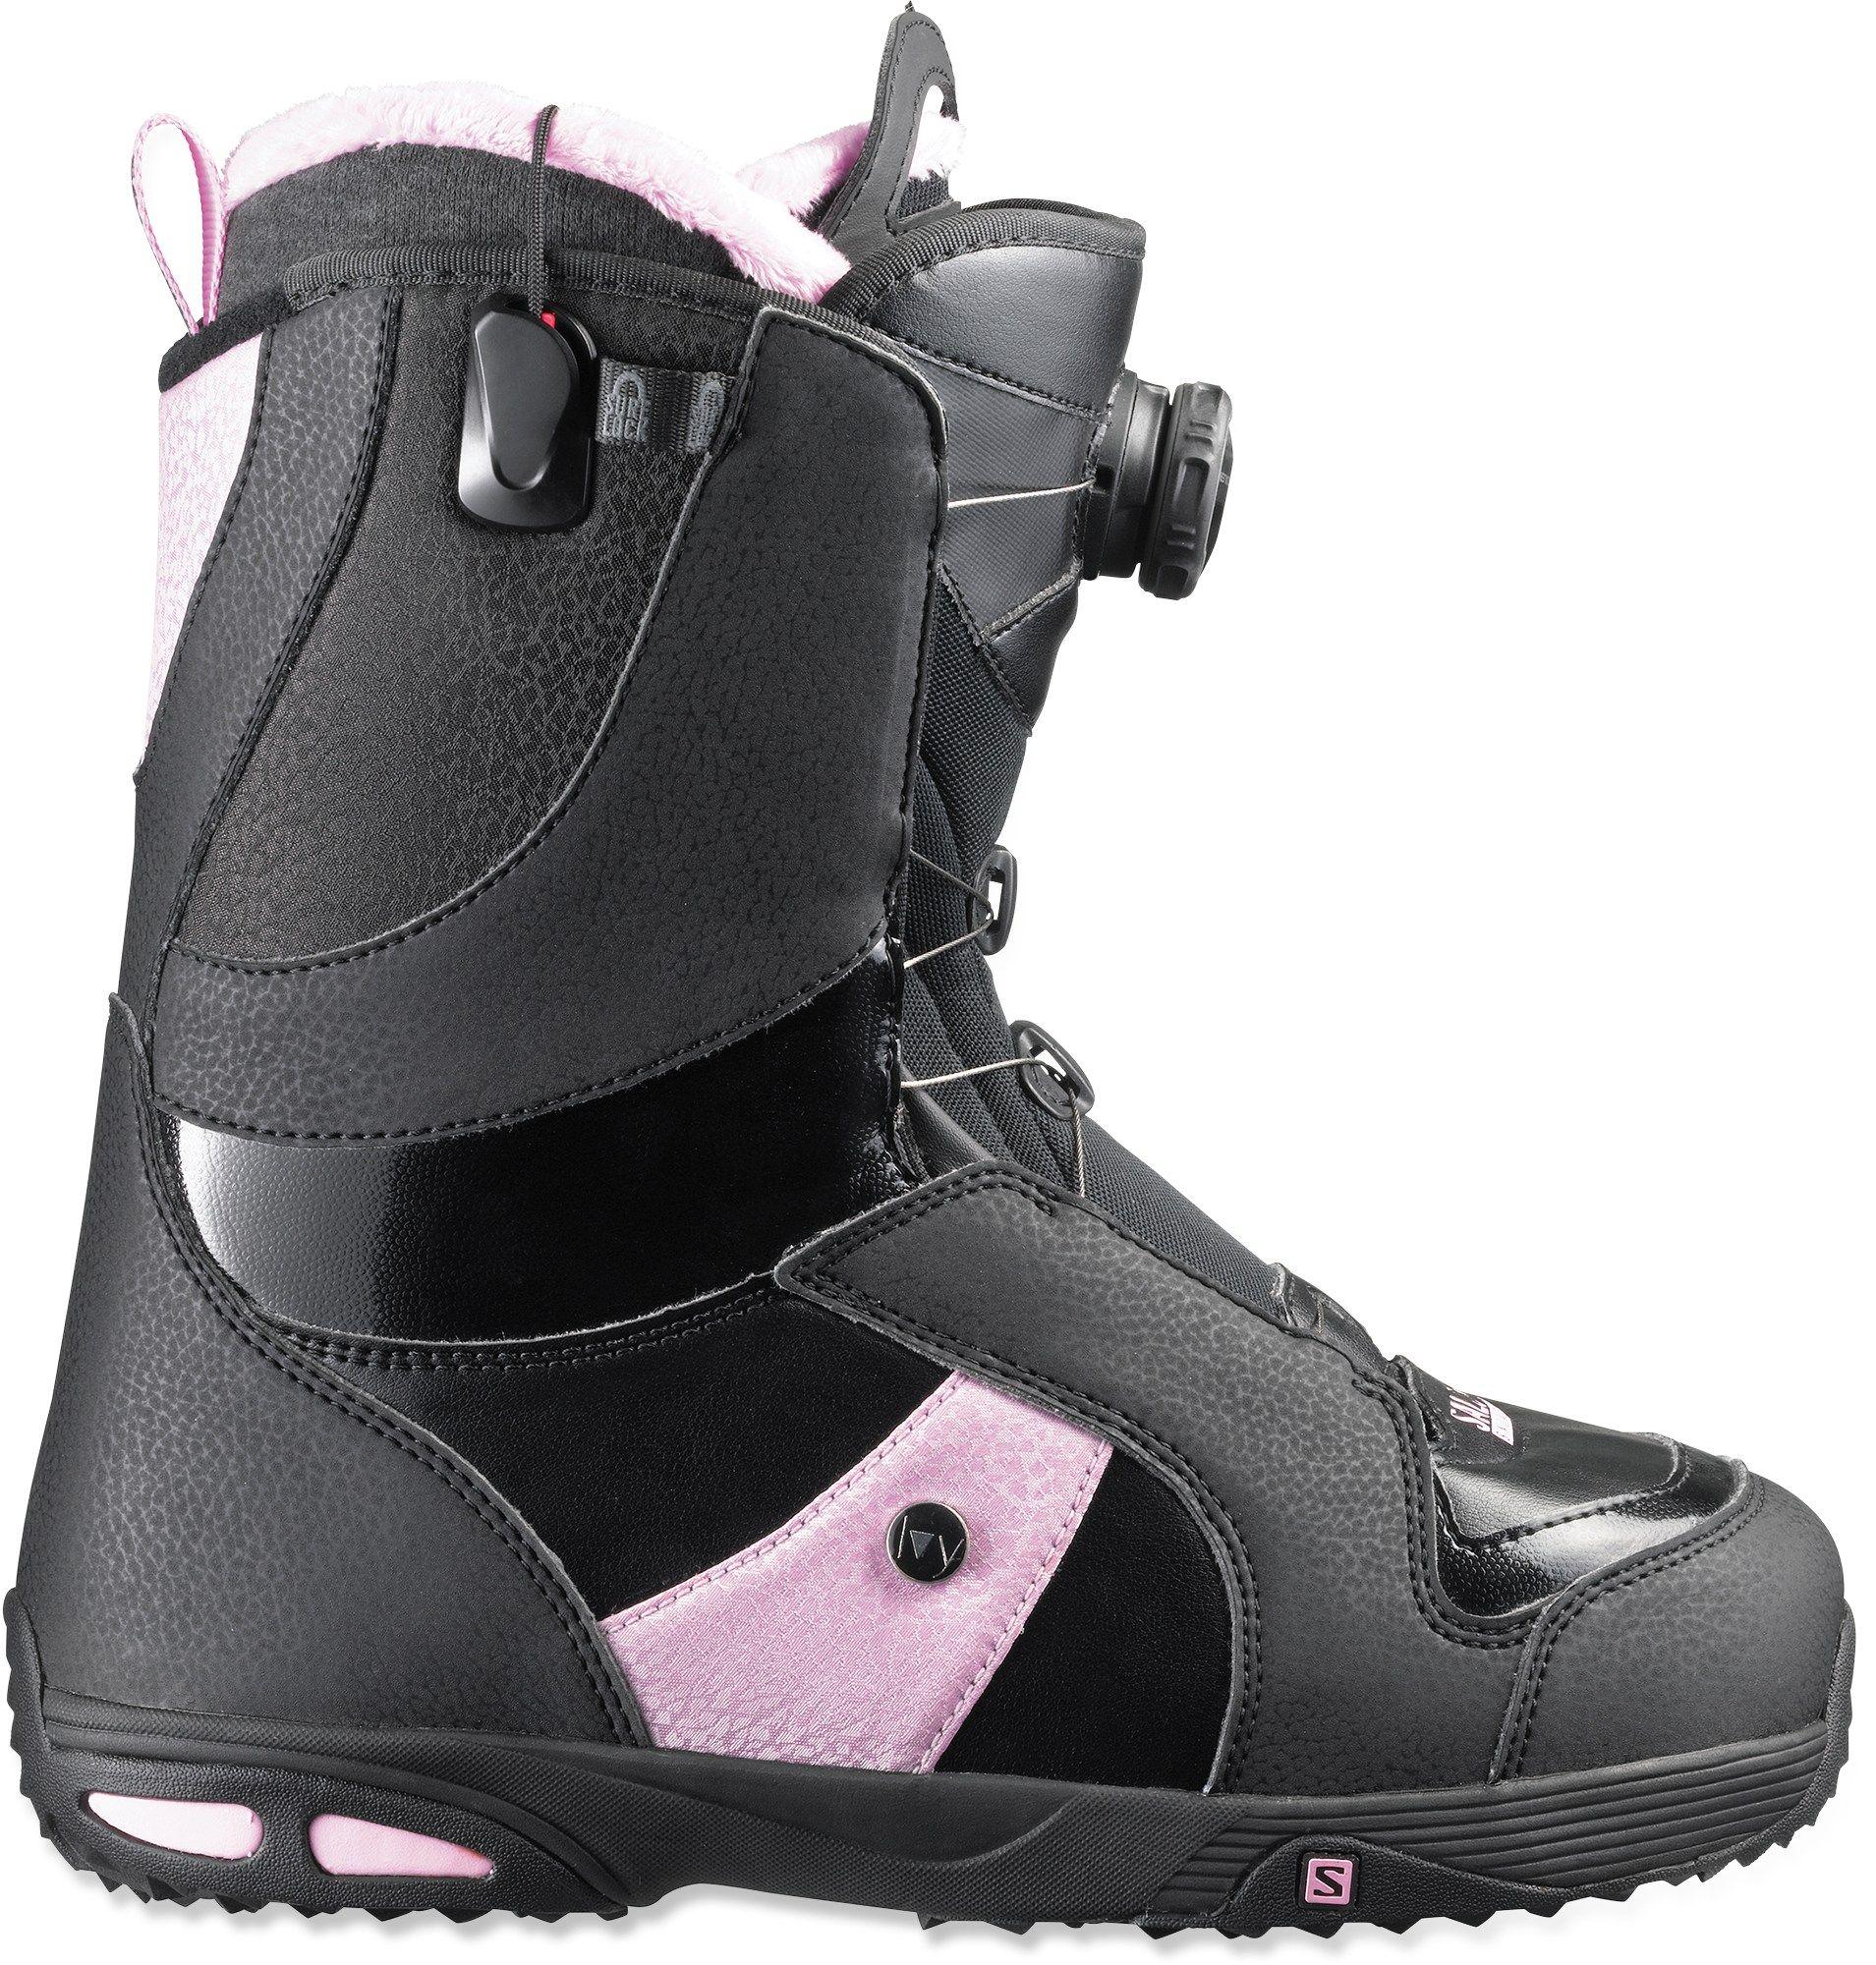 Salomon Female Ivy Boa Str8jkt Snowboard Boots Women S Snowboarding Women Boots Snowboard